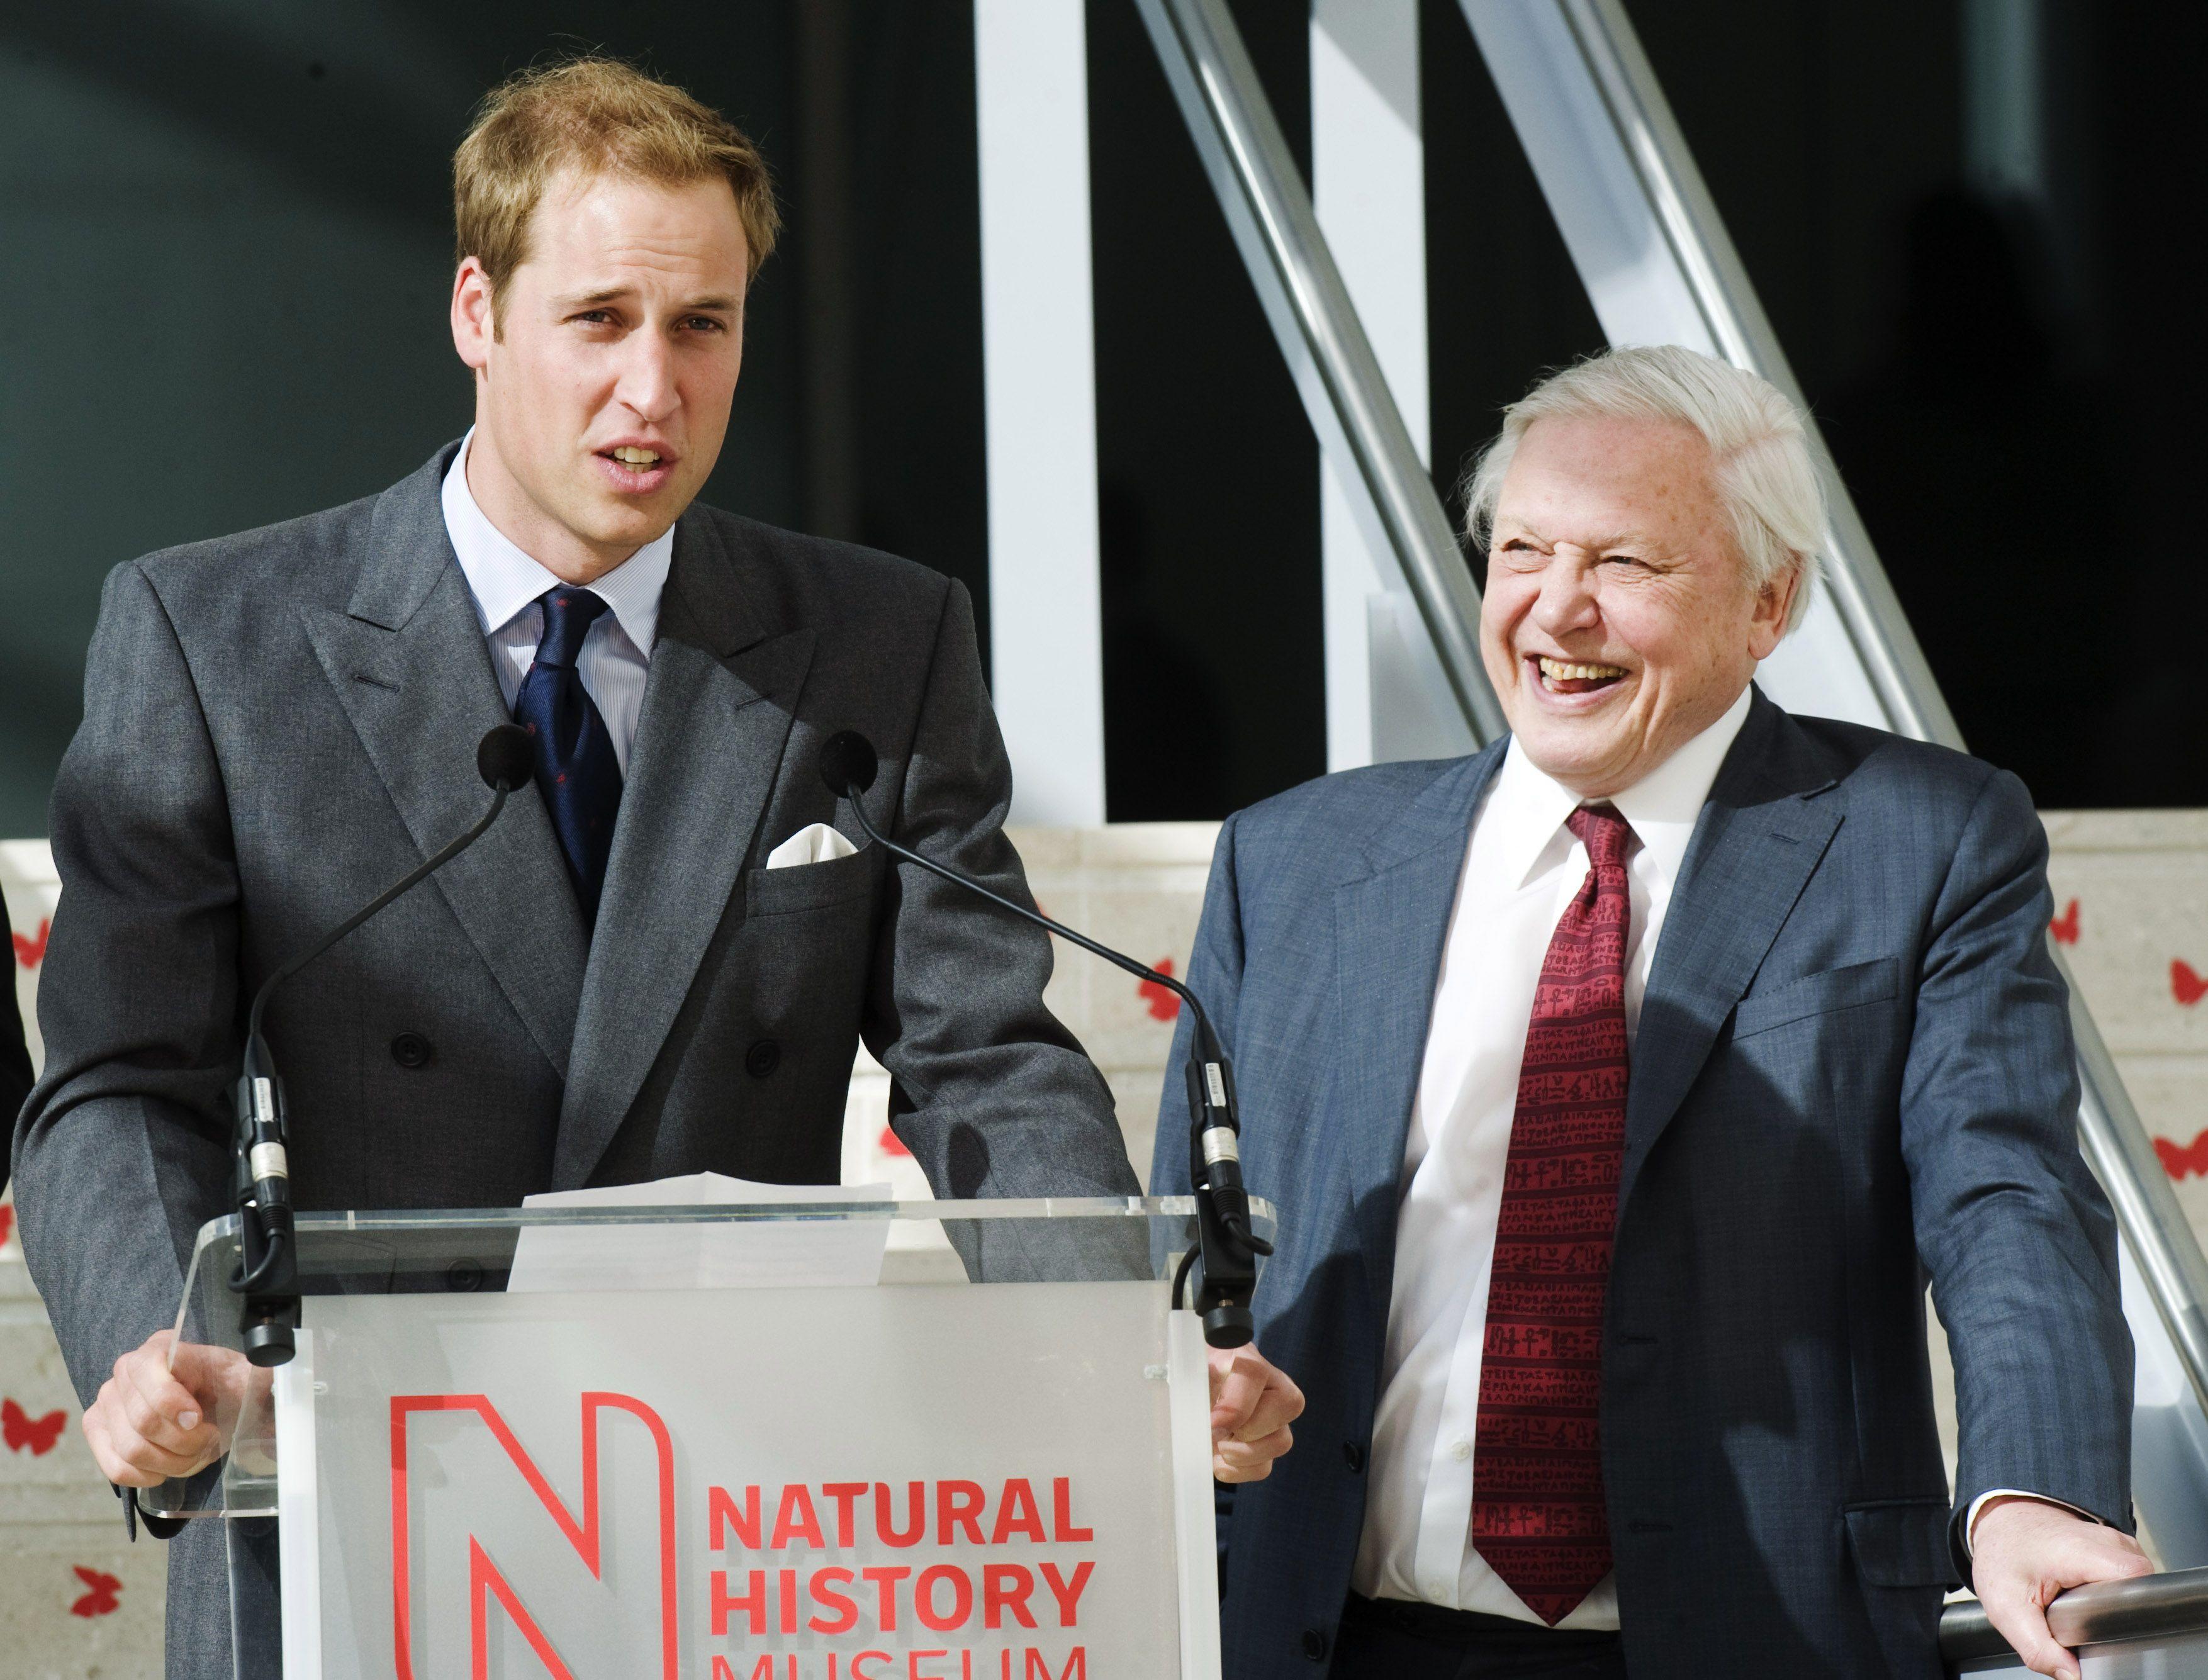 Prince William To Interview David Attenborough At Davos